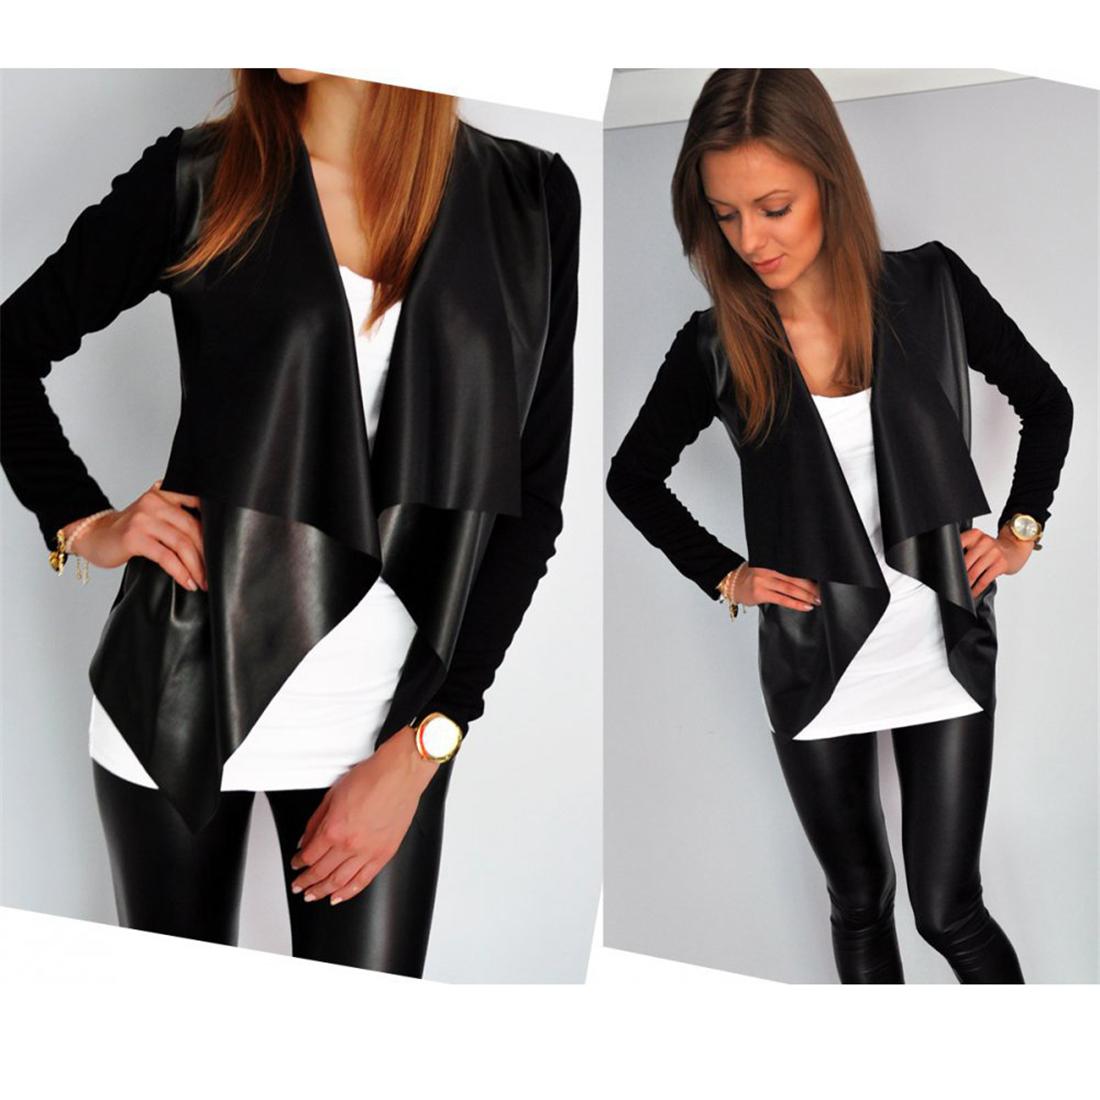 Autumn Winter PU Leather Jackets Women's Long Sleeve Irregular Punk Rock Basic Coats 2017 Slim Fit Patchwork Cool Black Outwear